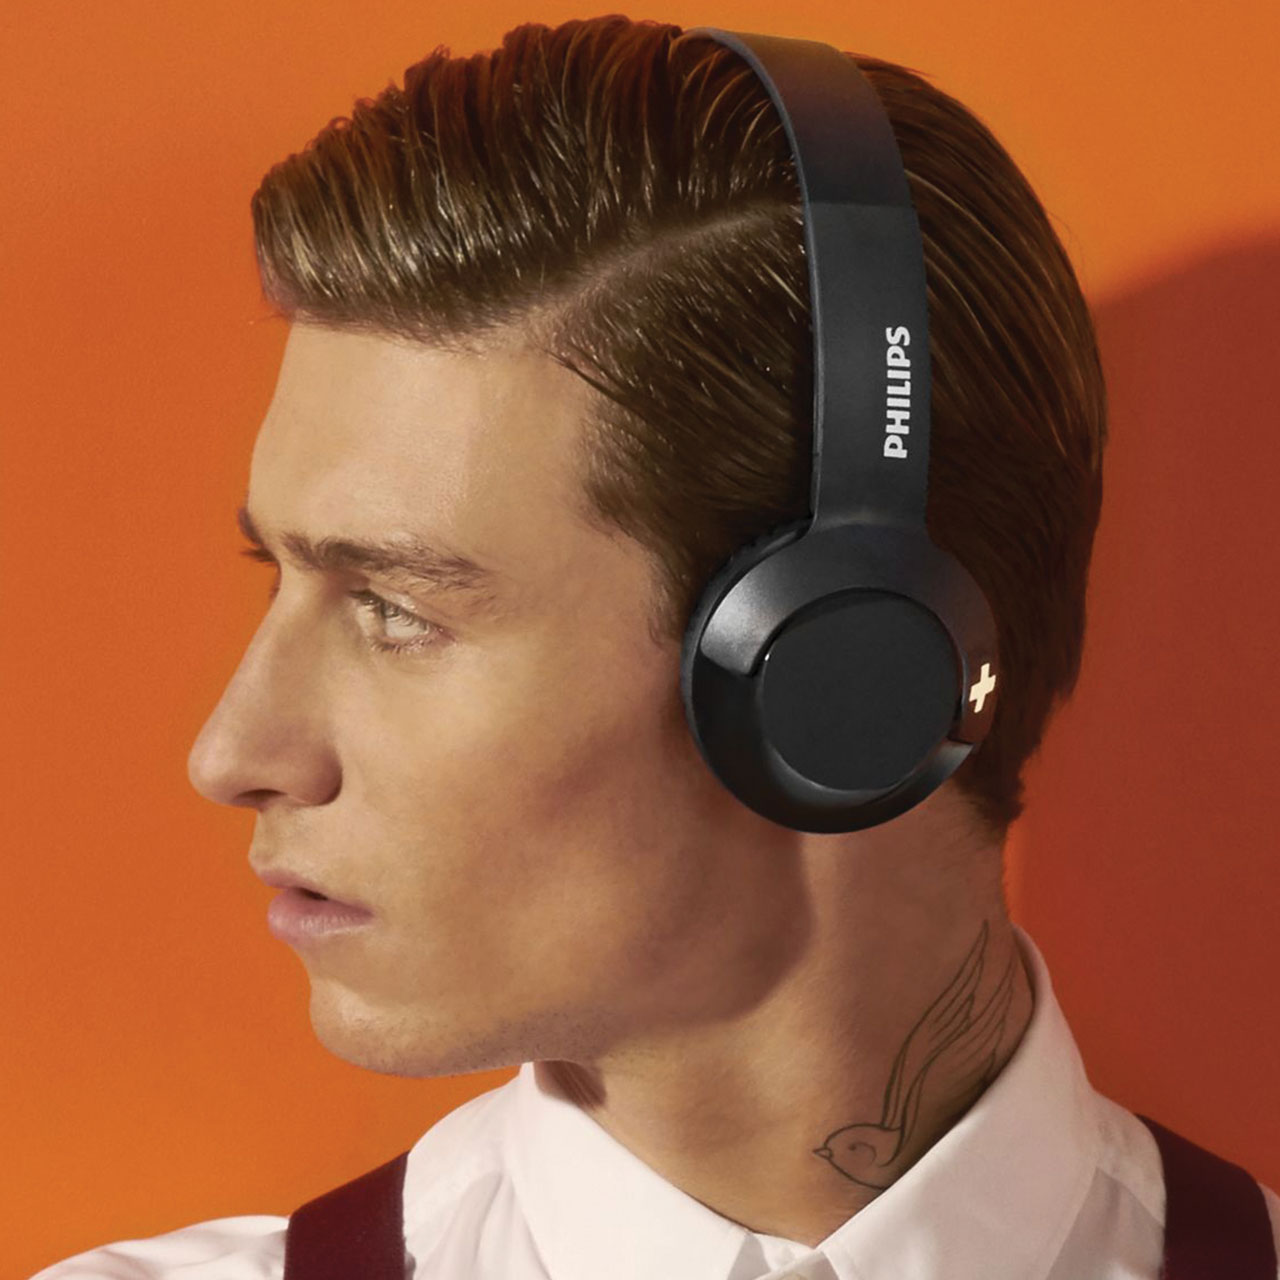 Philips Bass Bluetooth Headband Headphone With Mic White